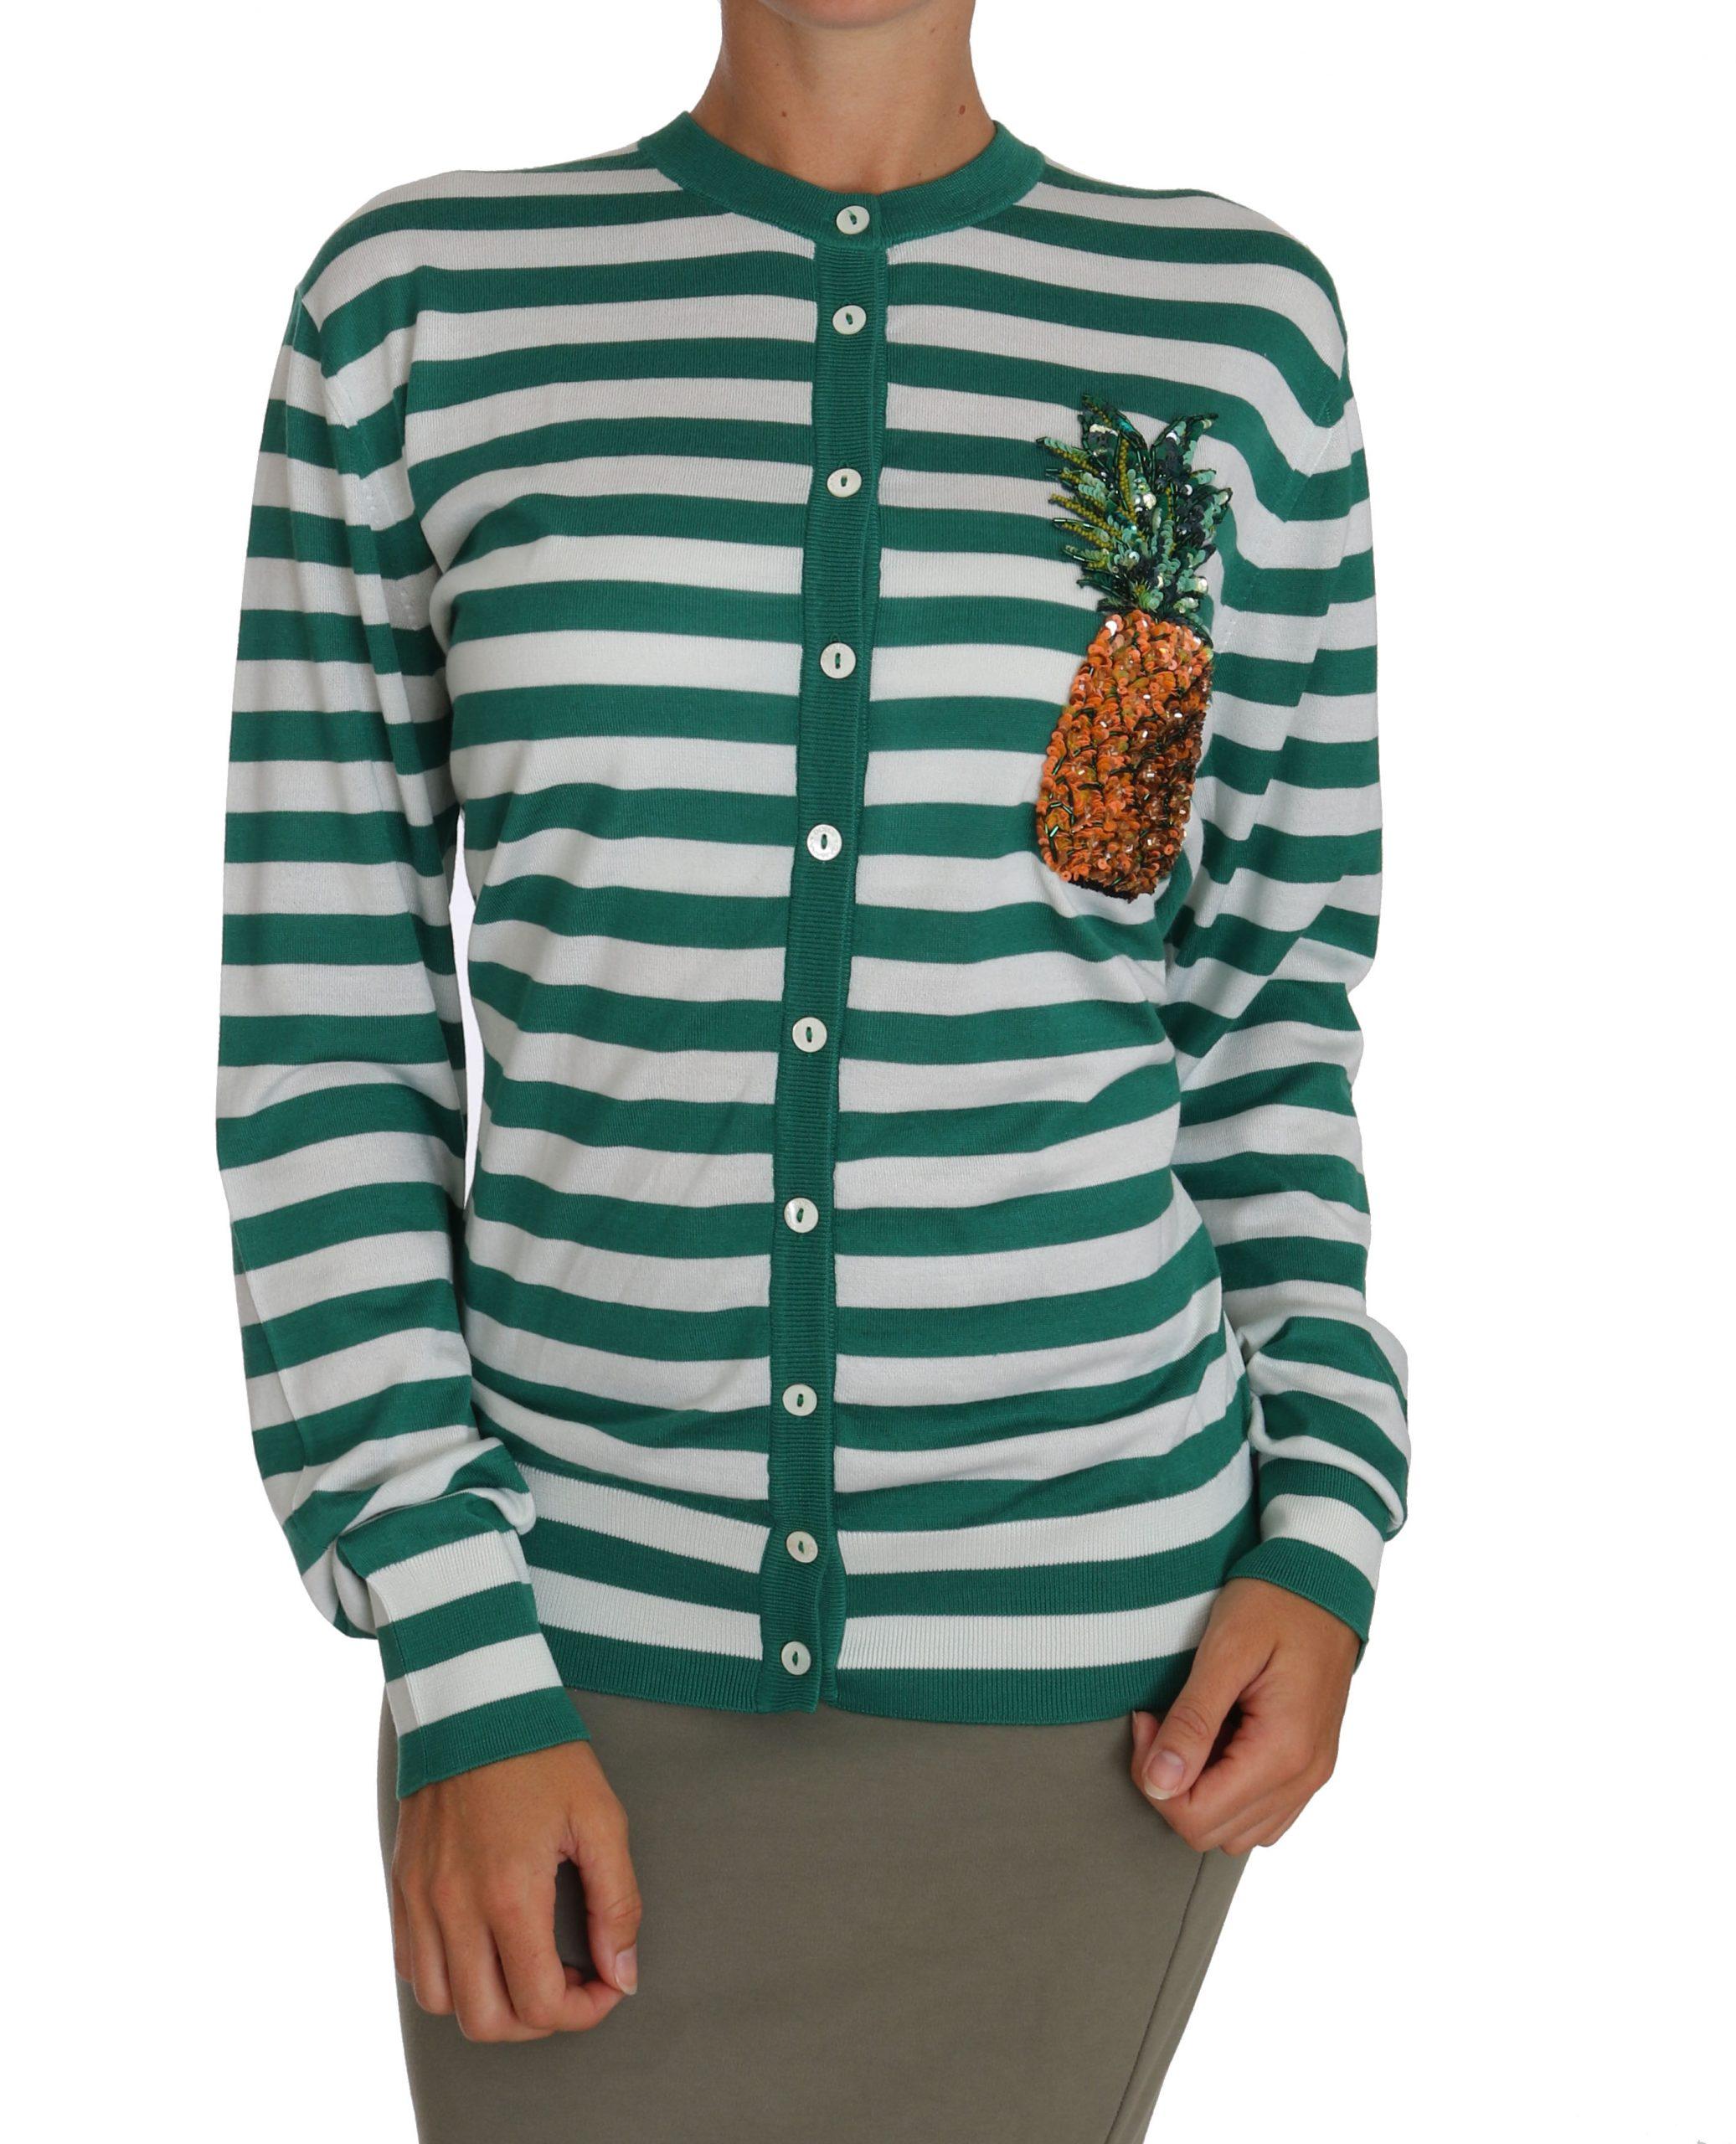 Dolce & Gabbana Women's Embellished Striped Cardigan Green TSH2752 - IT46 | L